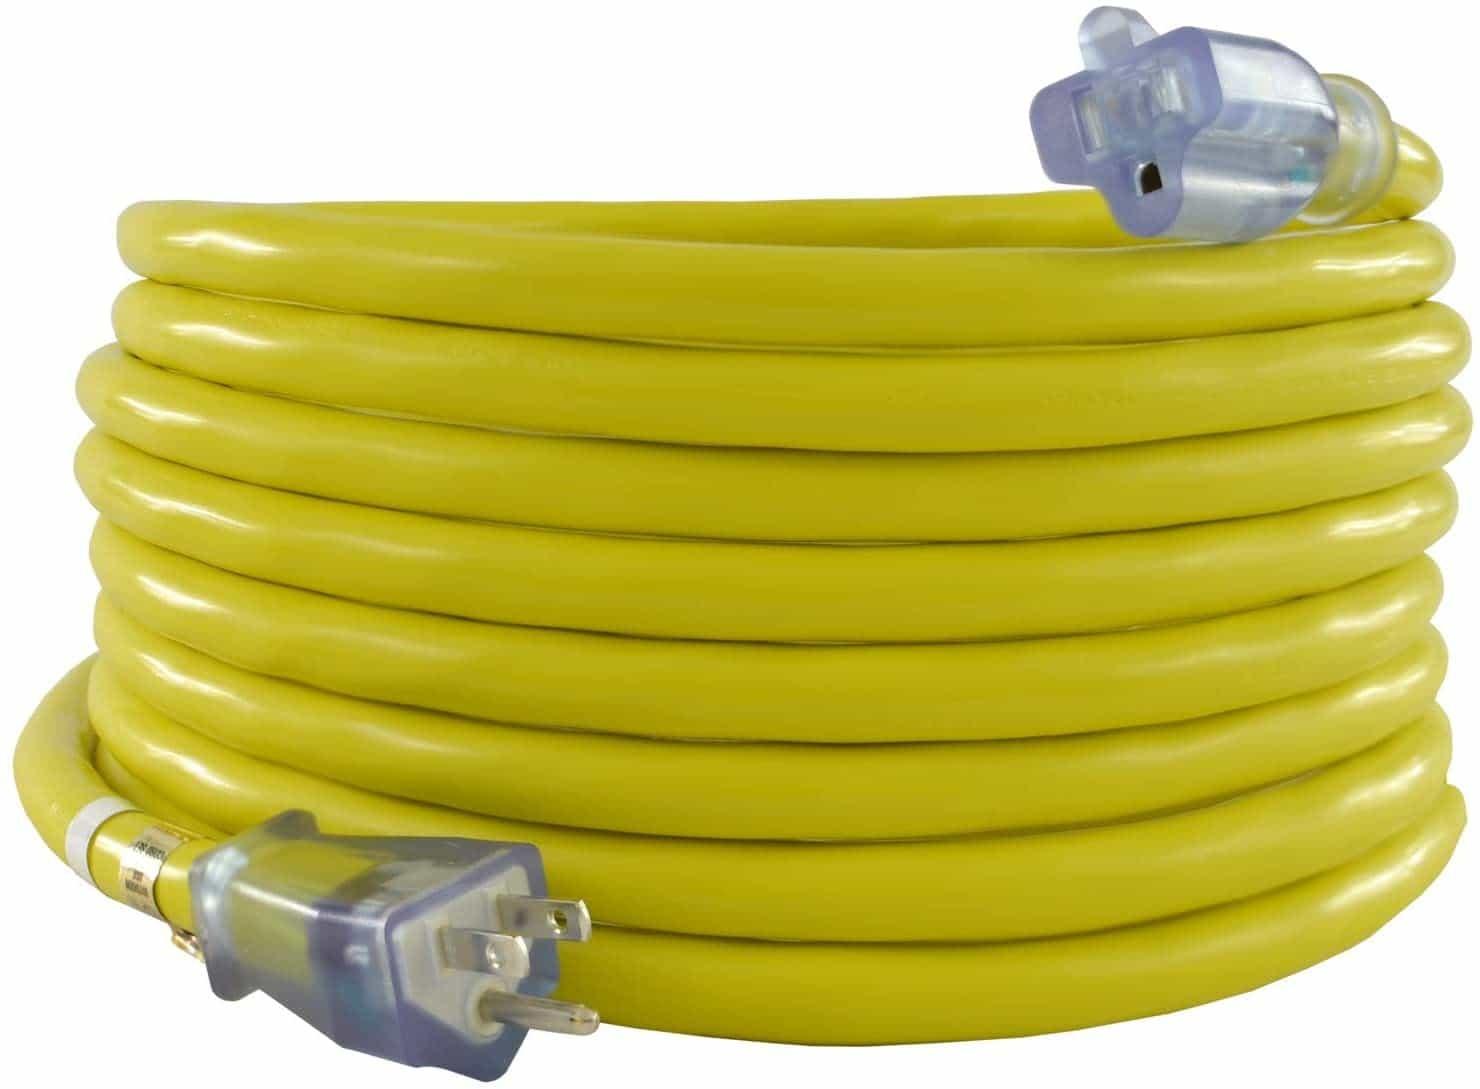 Conntek 15 Amp 10 Gauge Outdoor Extension Cords